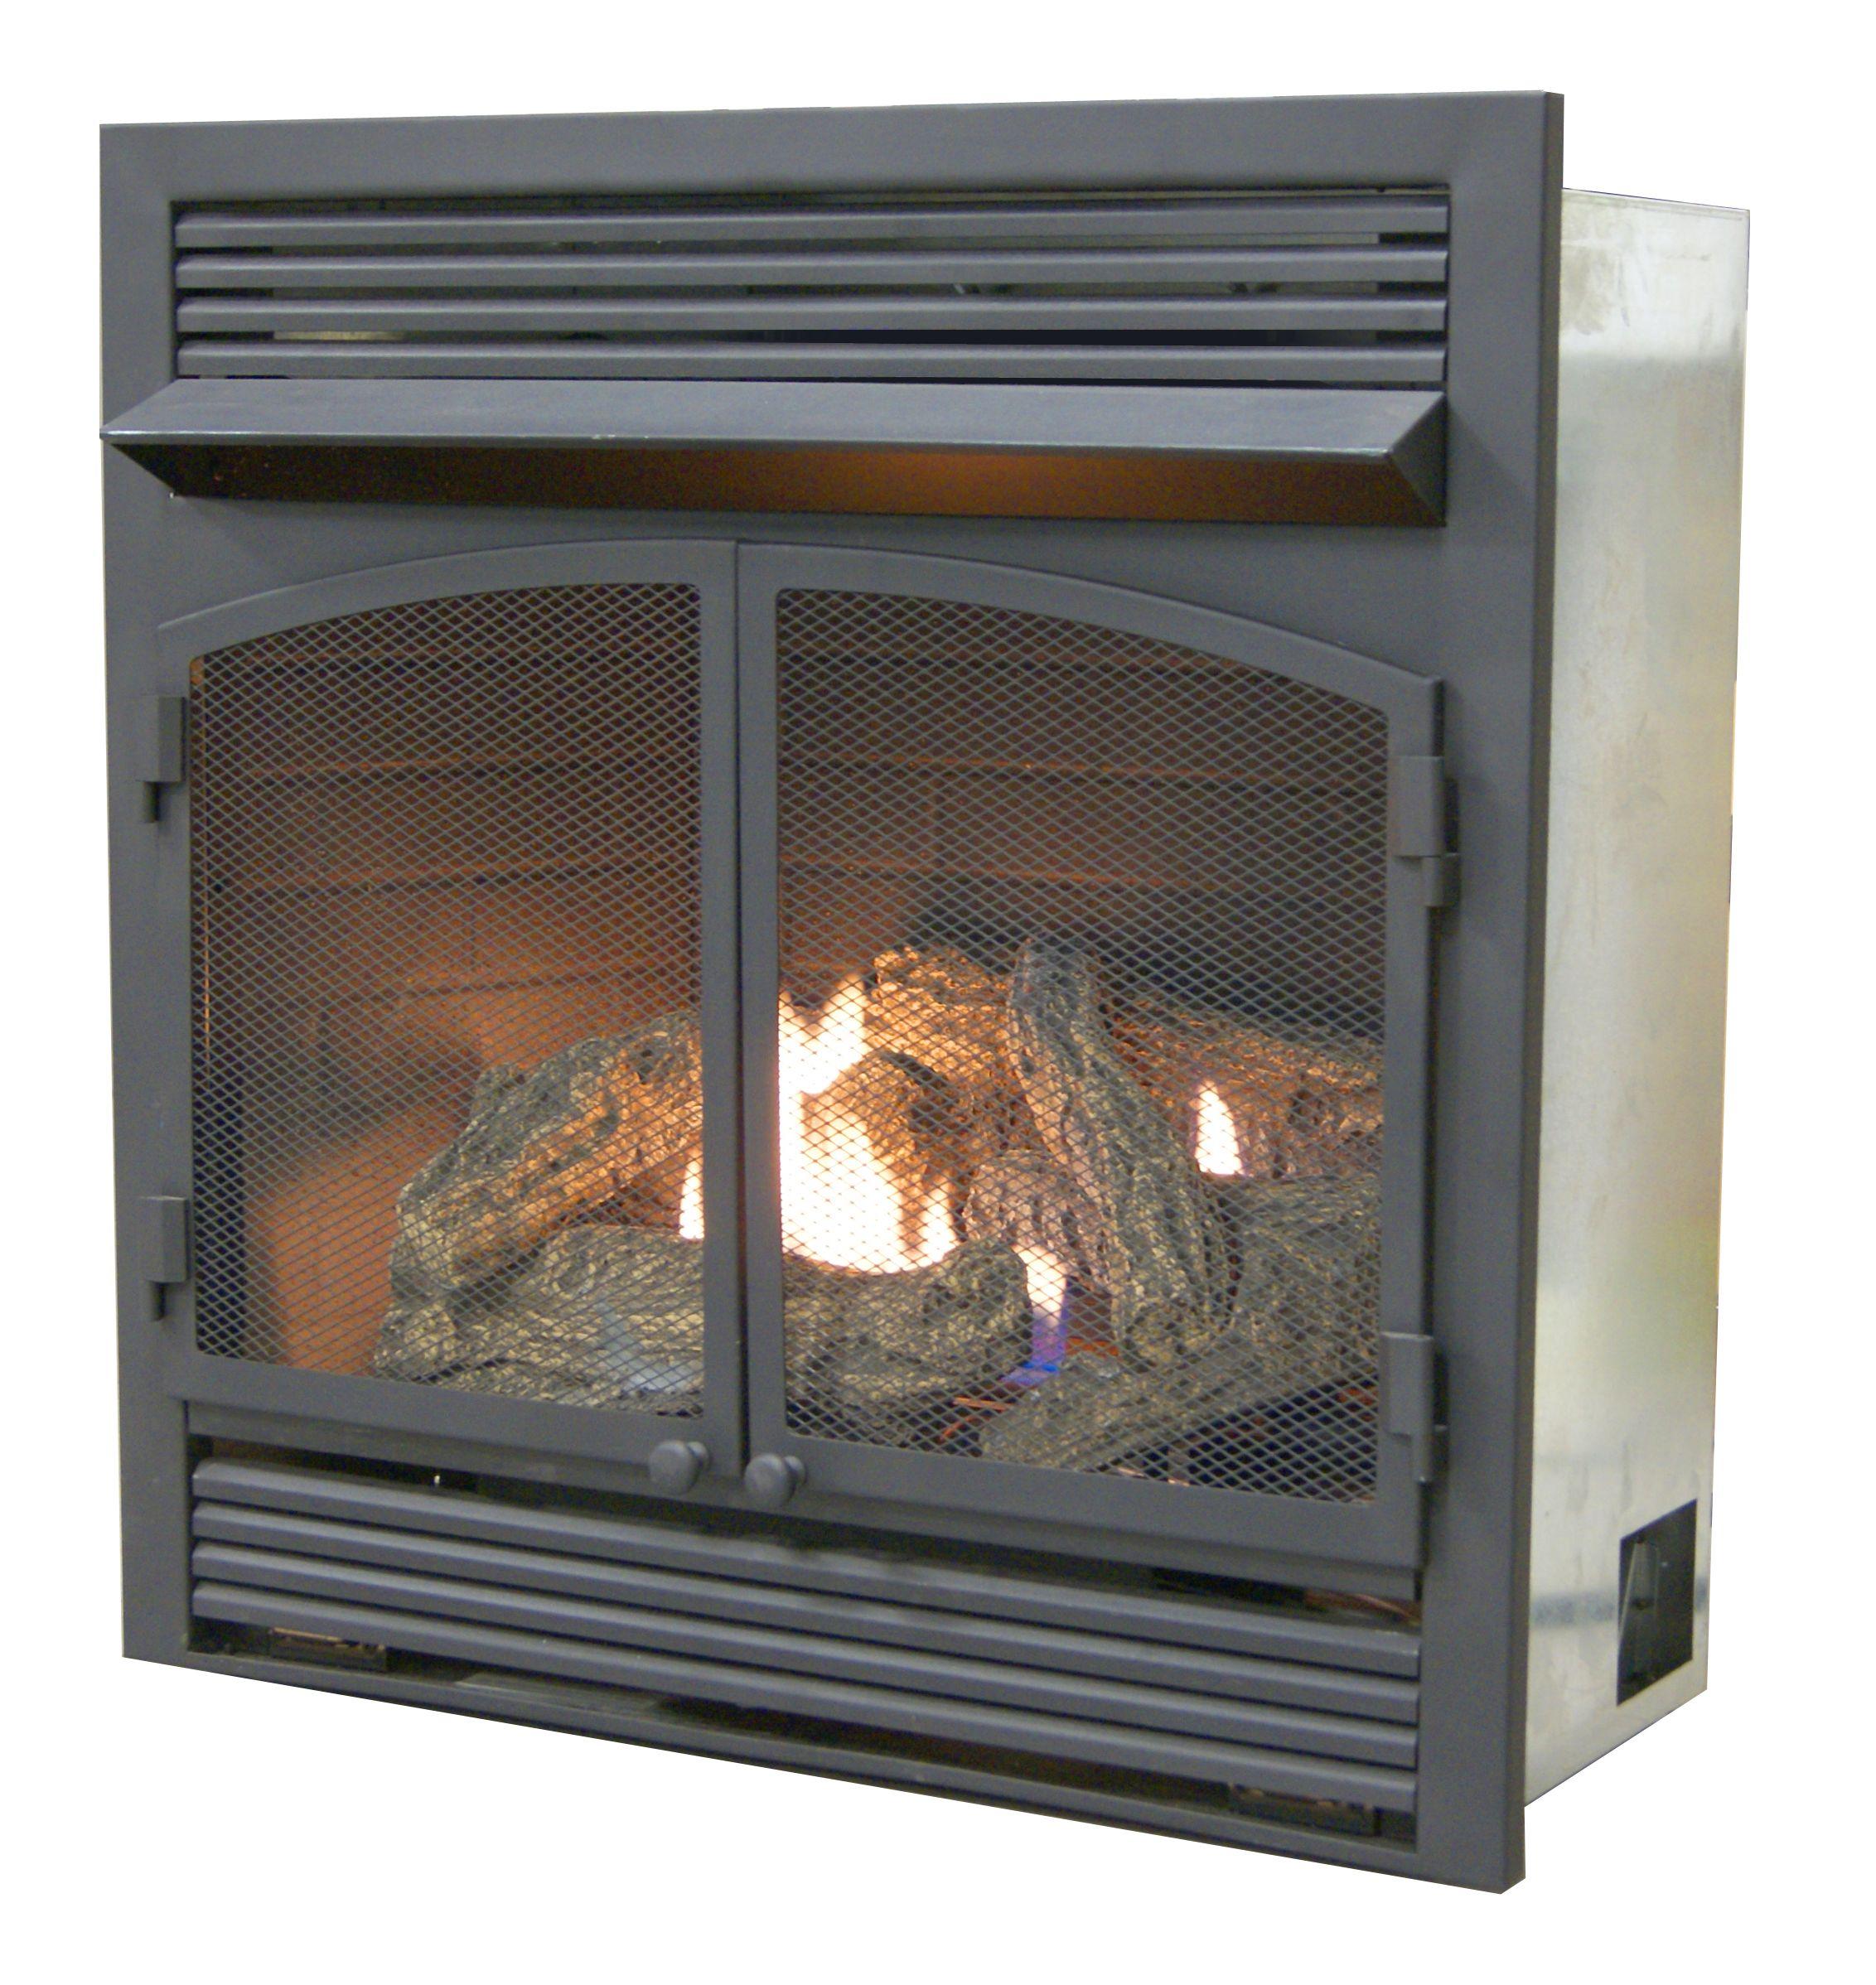 Dual Fuel Fireplace Insert Zero Clearance 32 000 Btu Fireplace